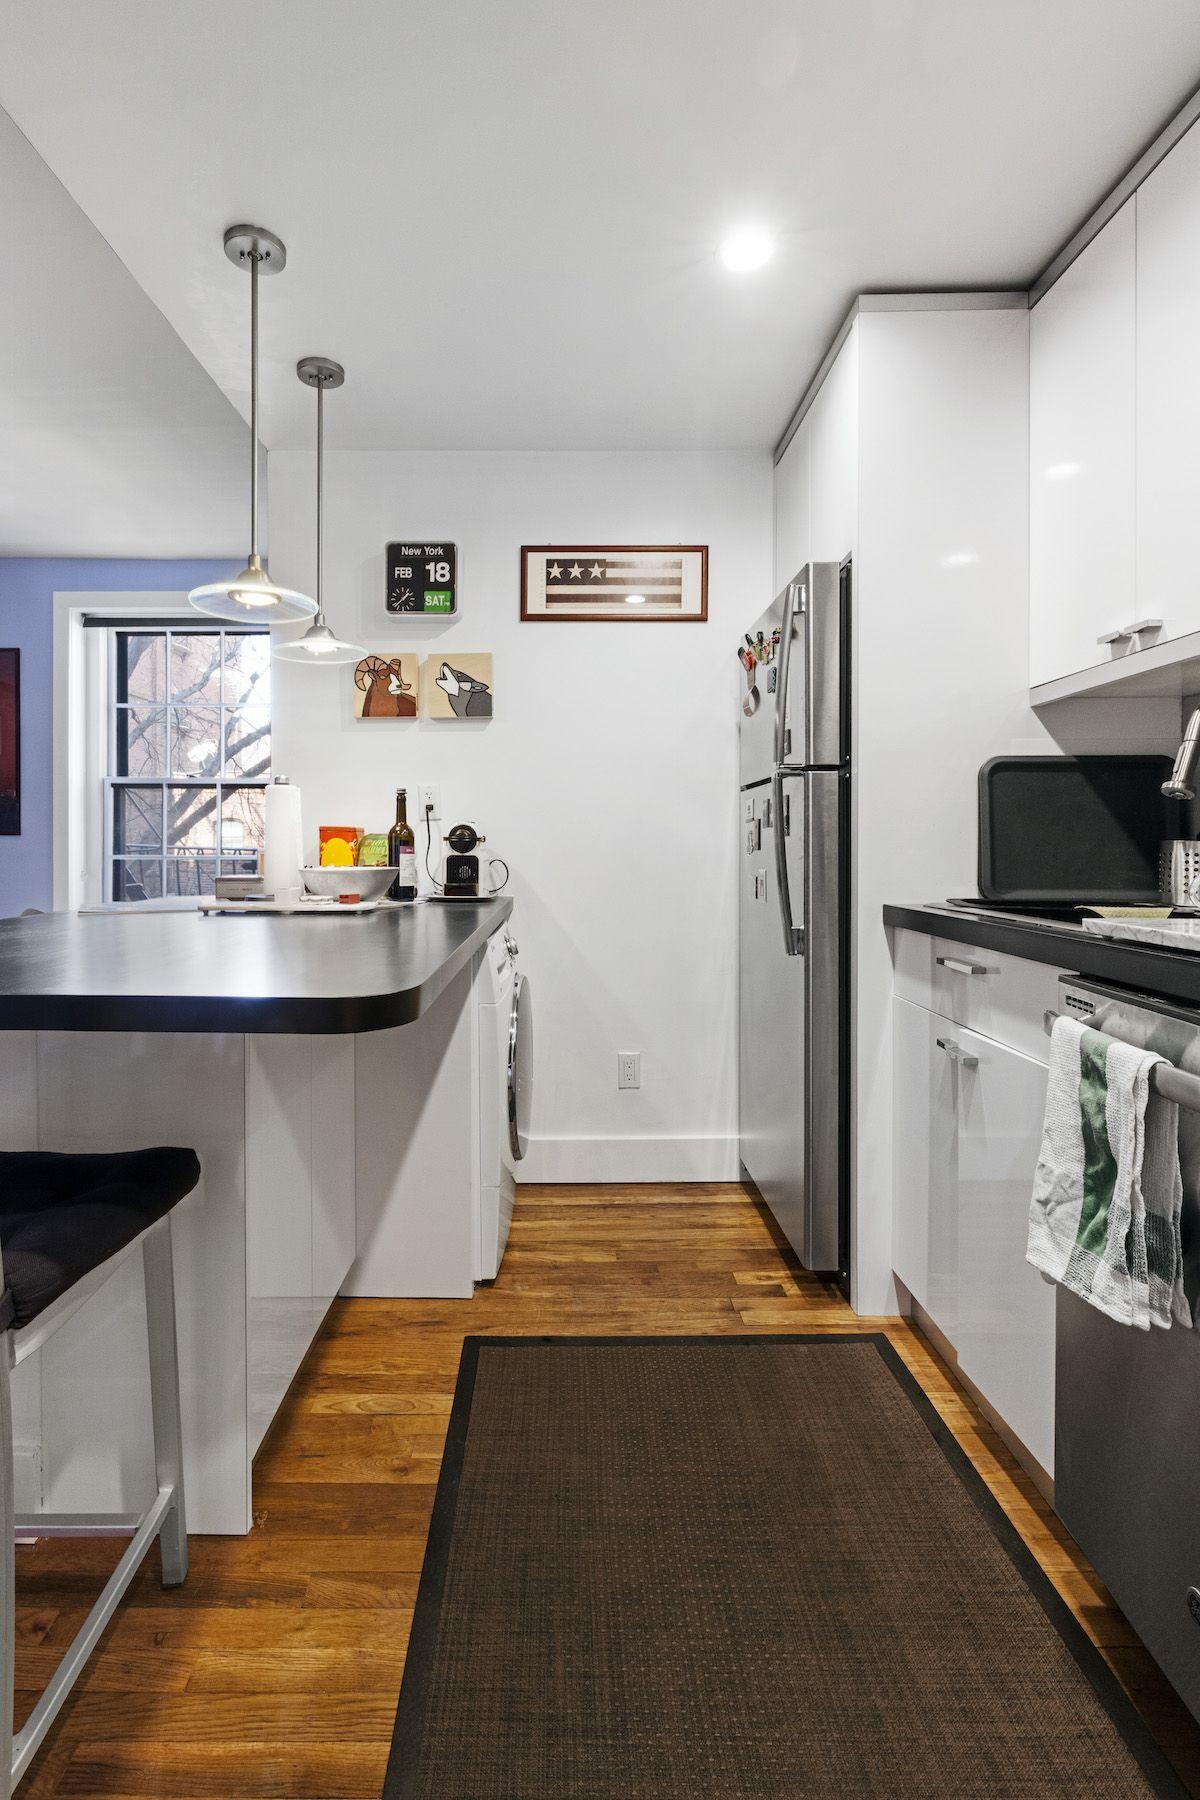 Amazing New Little Kitchen Frieze - Kitchen Cabinets | Ideas ...